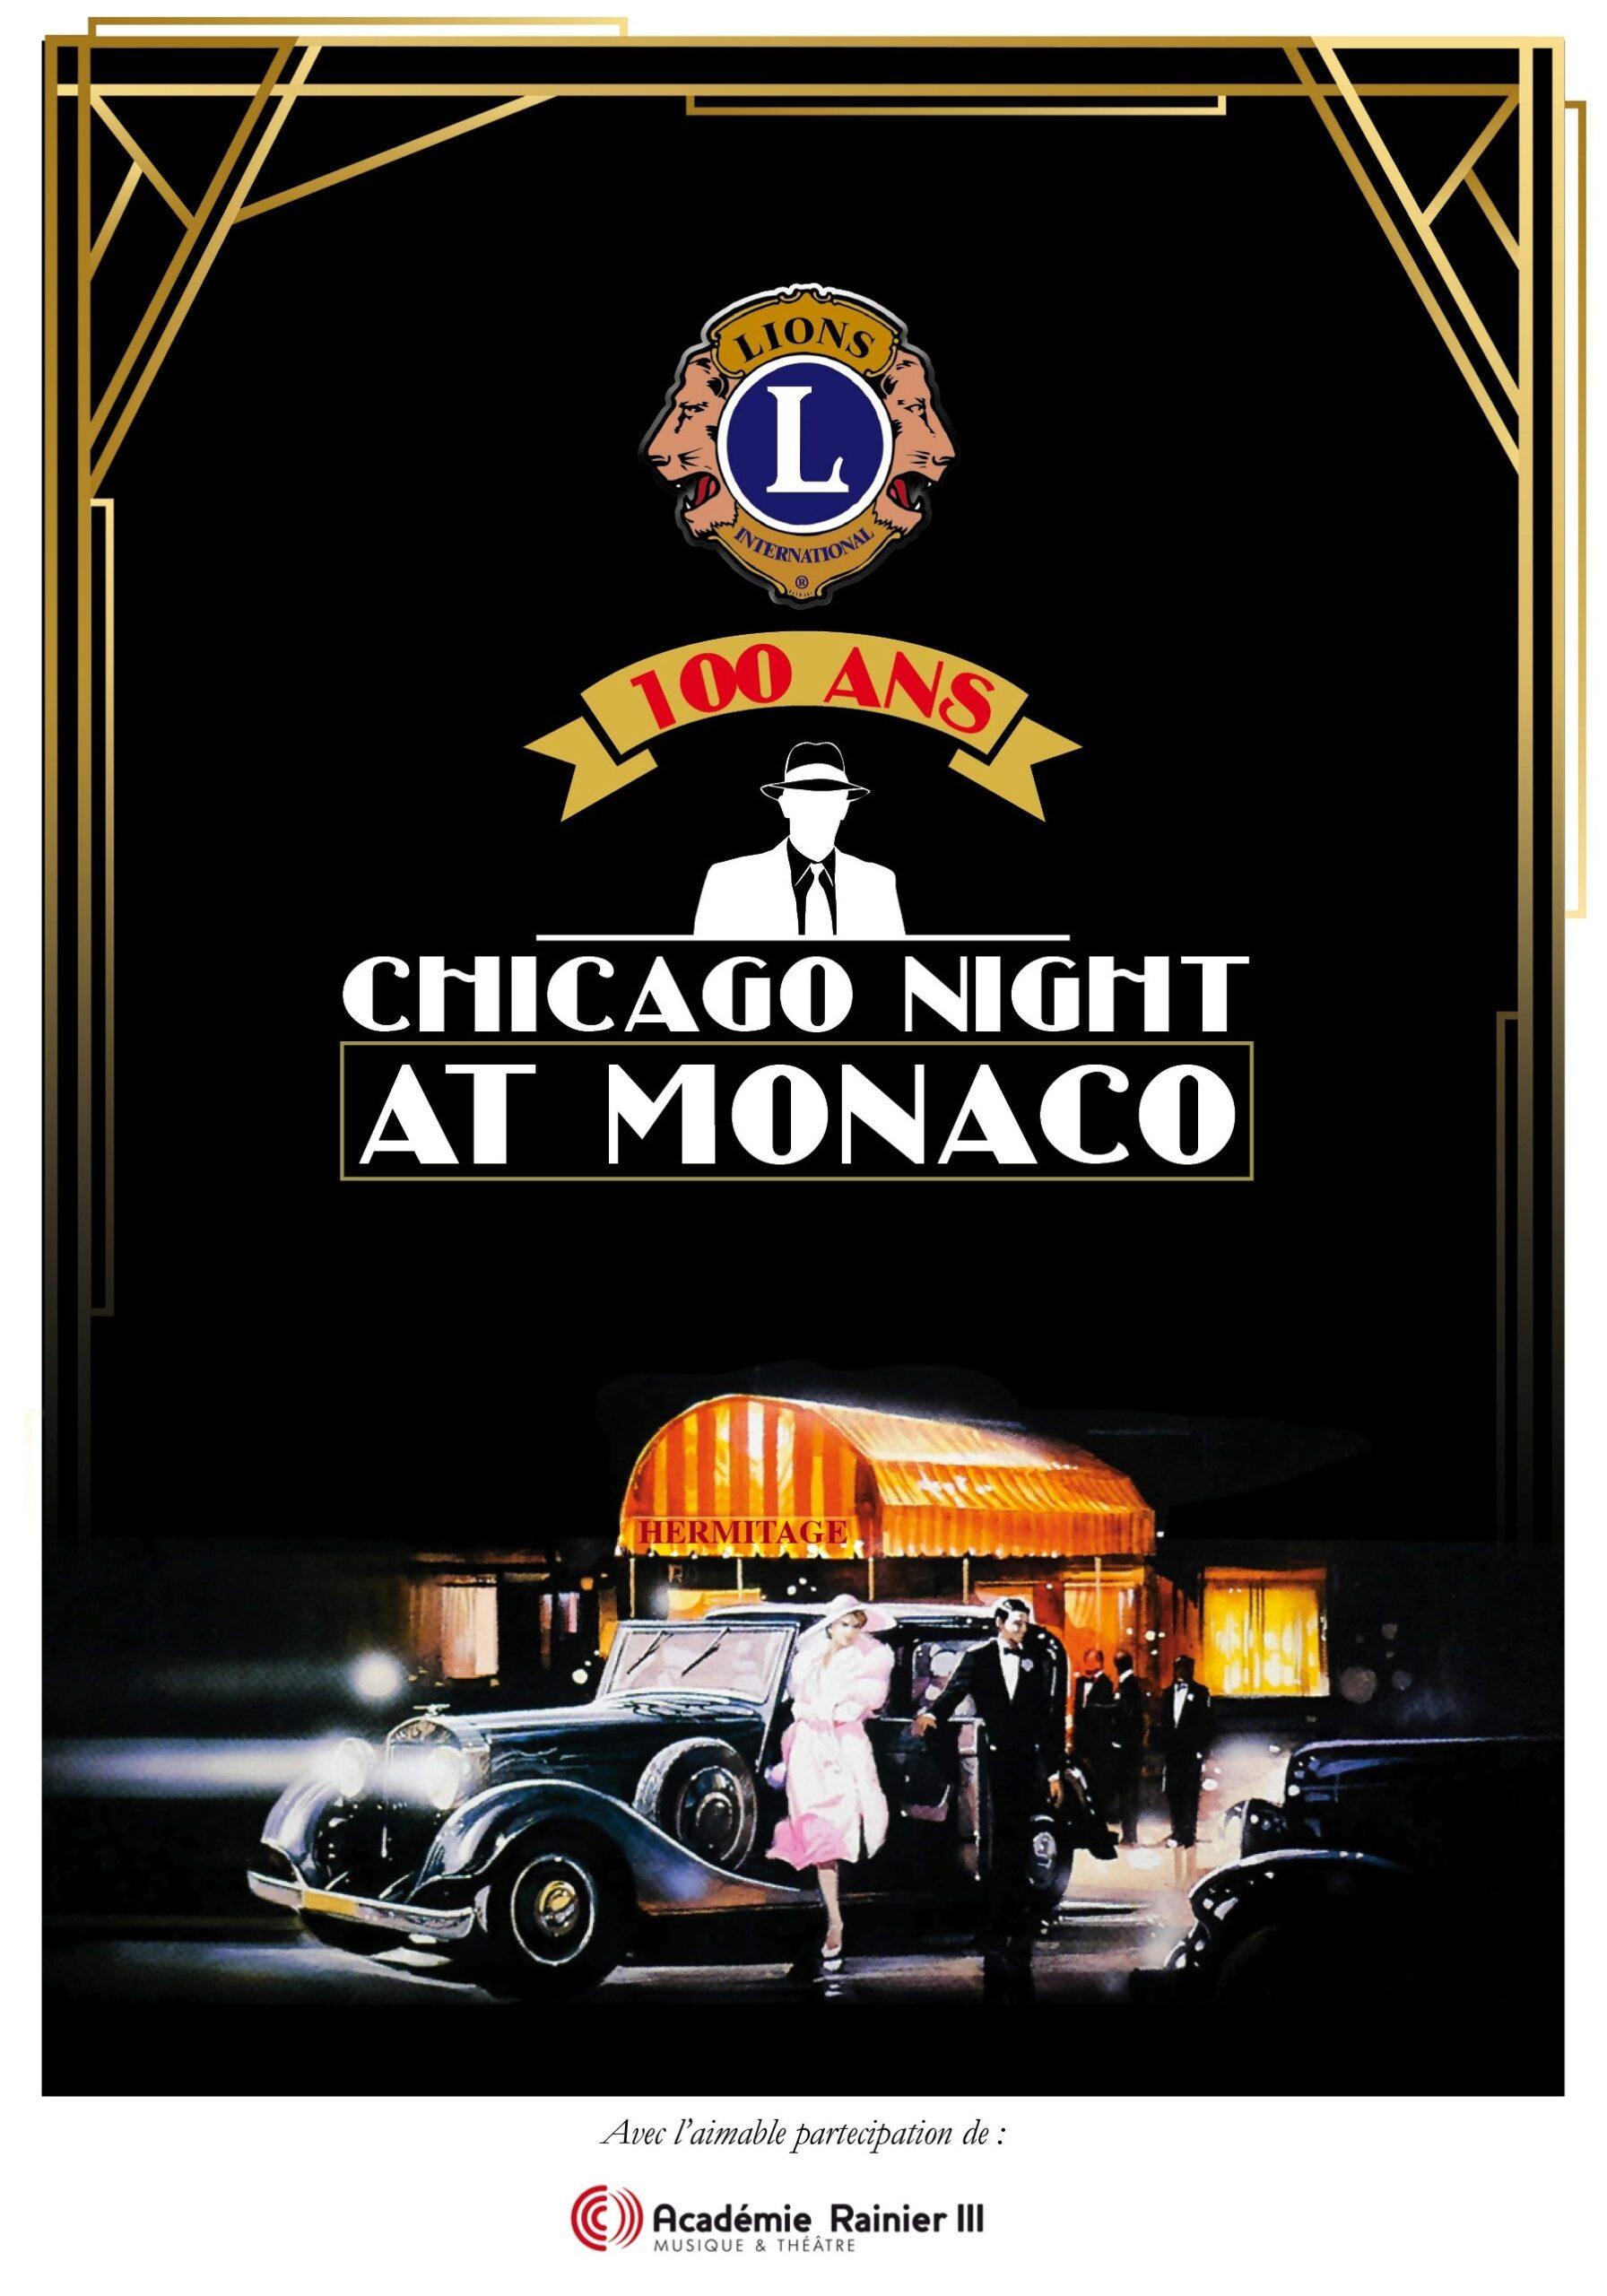 CHICAGO NIGHT – 100 ANS DU LIONS CLUB INTERNATIONAL